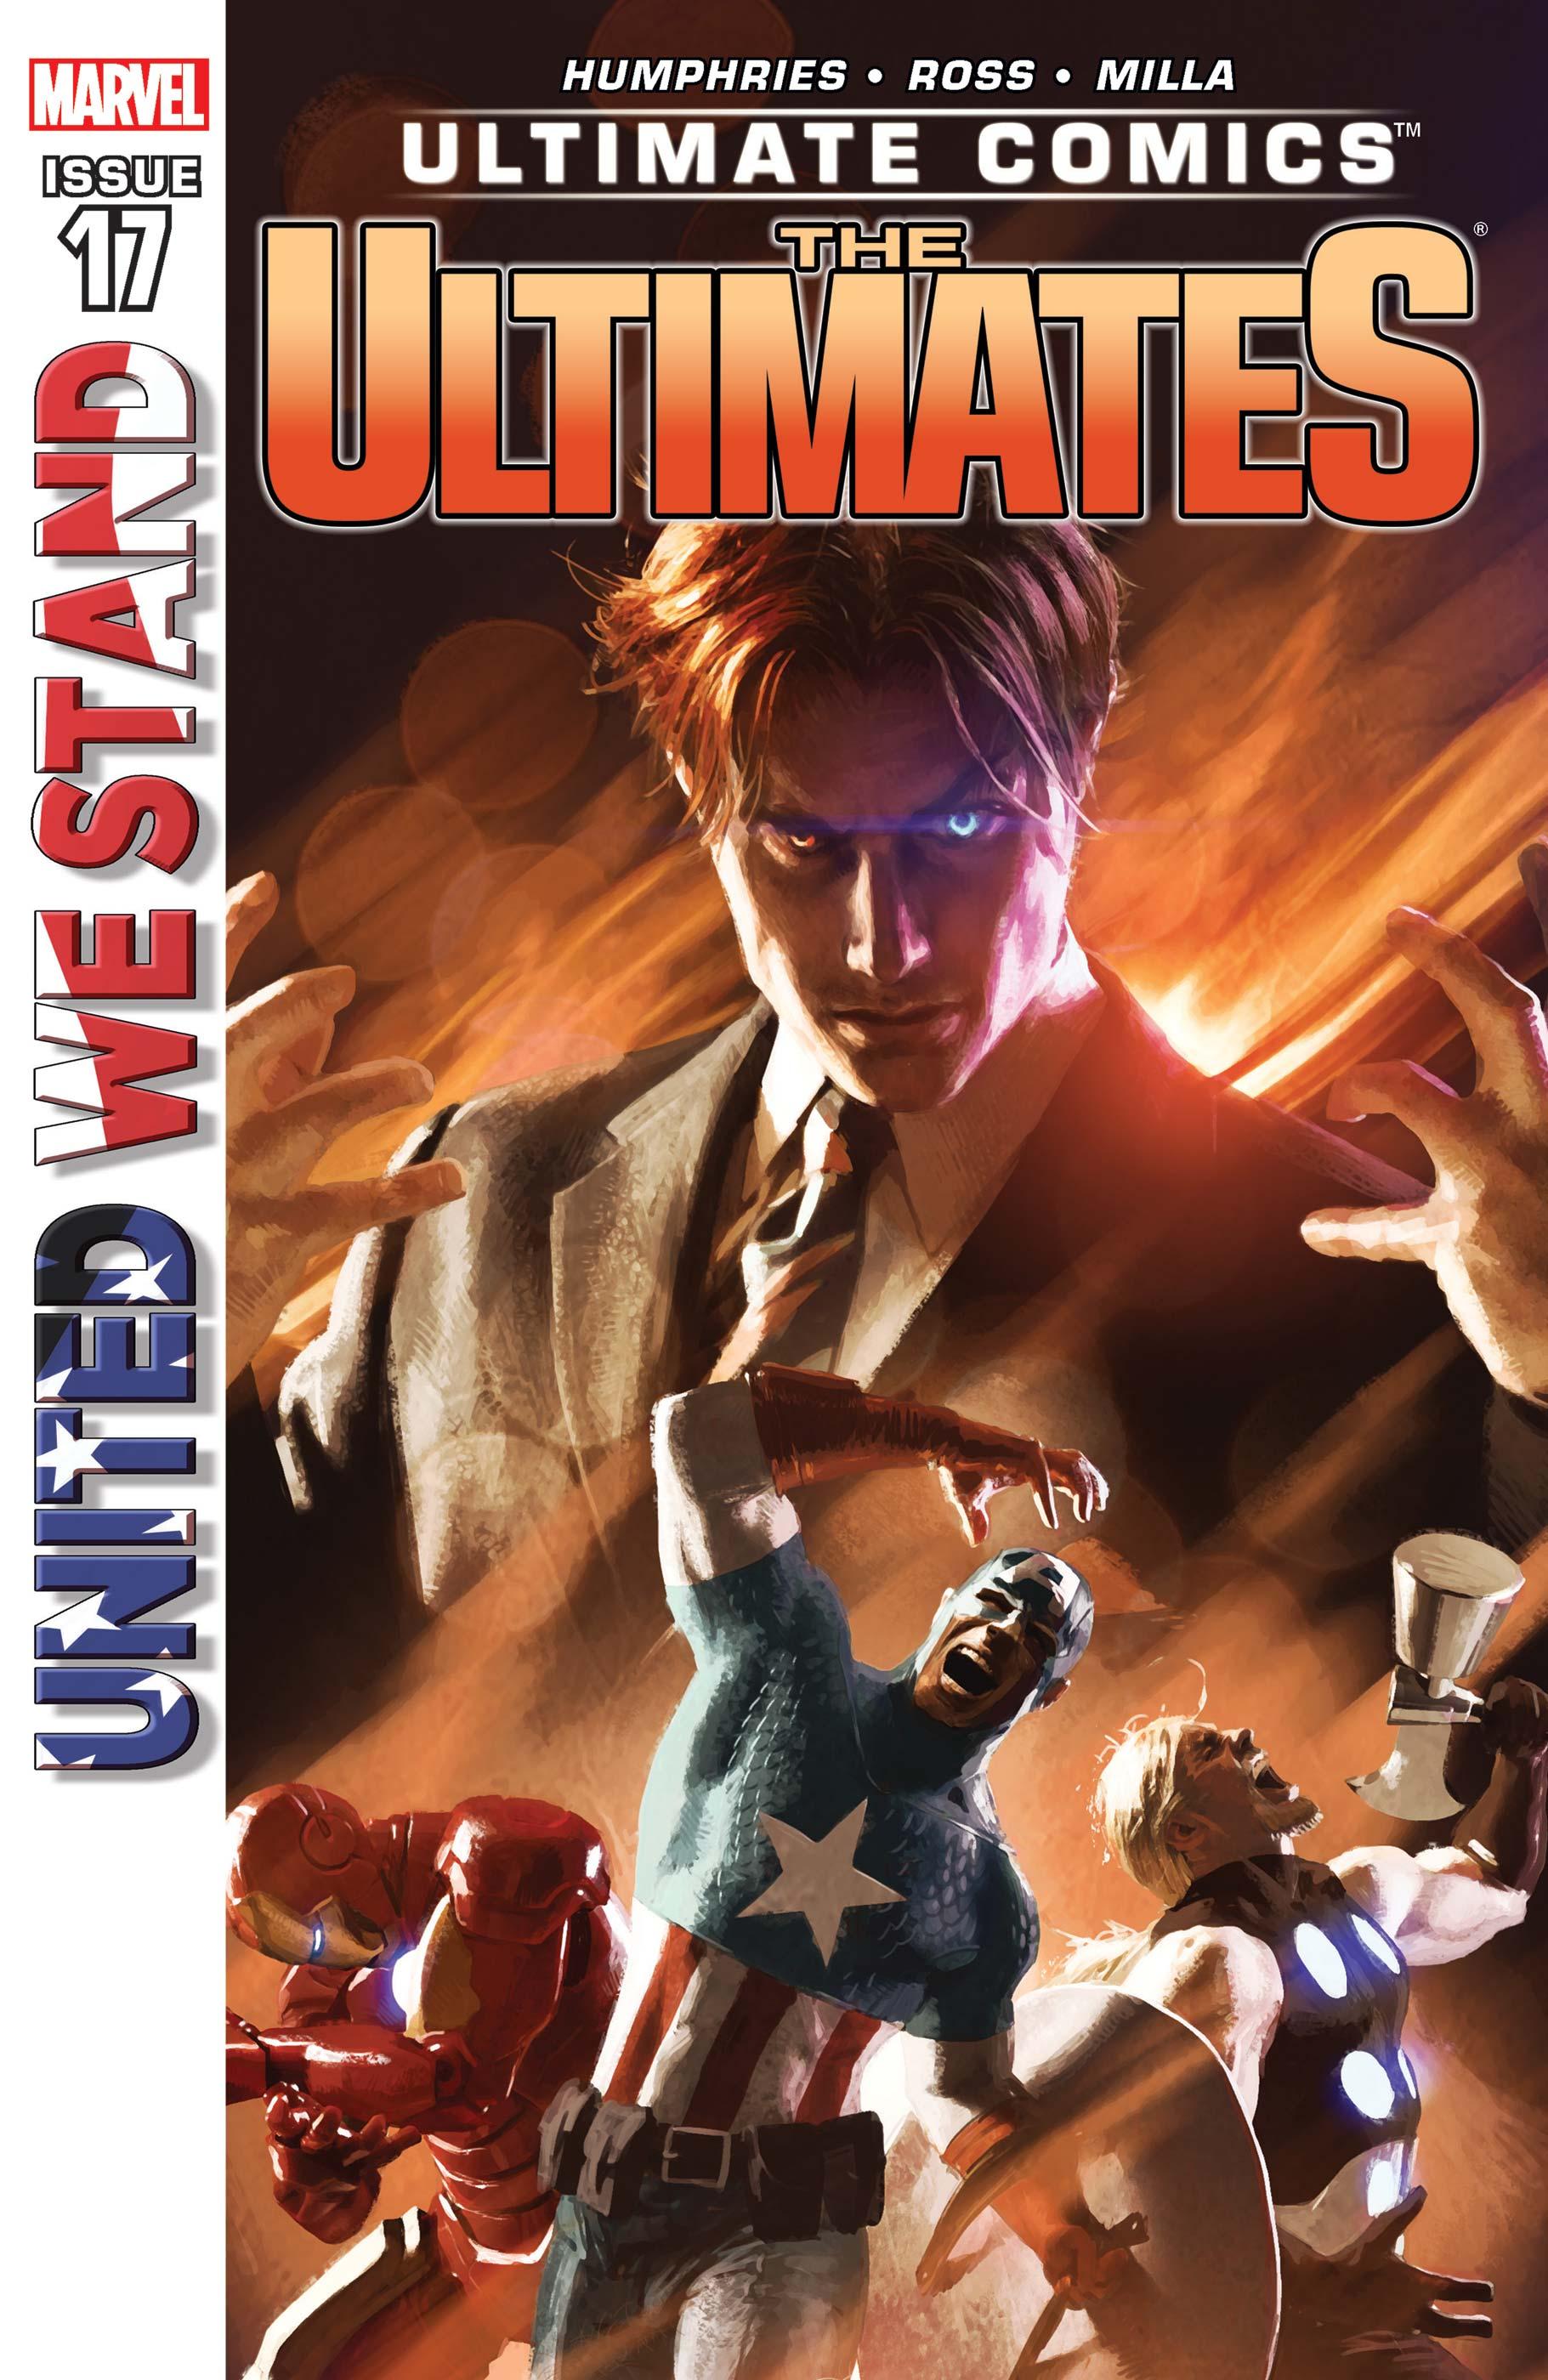 Ultimate Comics Ultimates  (2011) #17